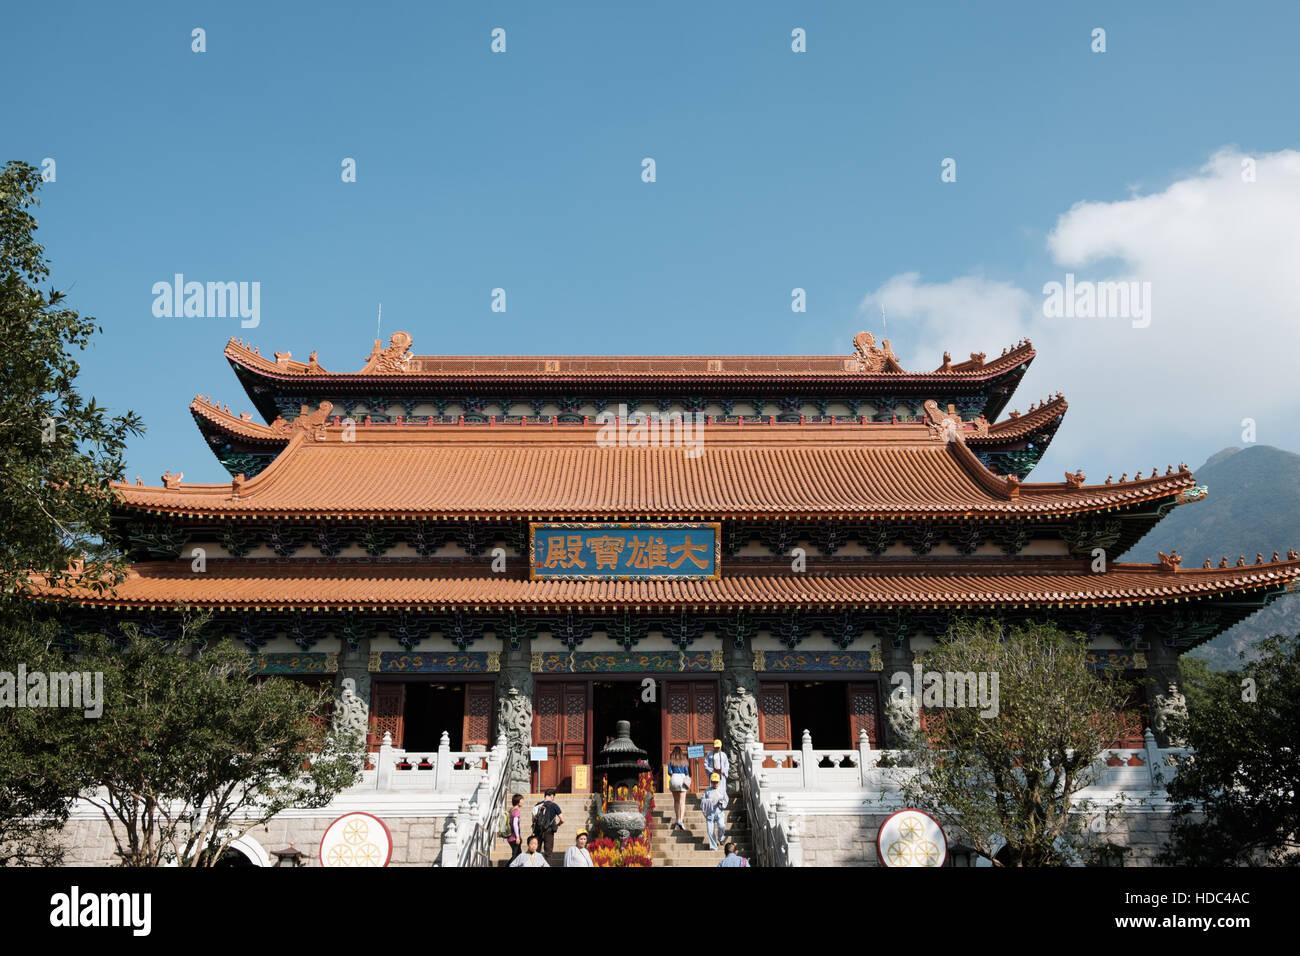 The main shrine Po Lin Monastery Lantau Island Hong Kong Asia - Stock Image